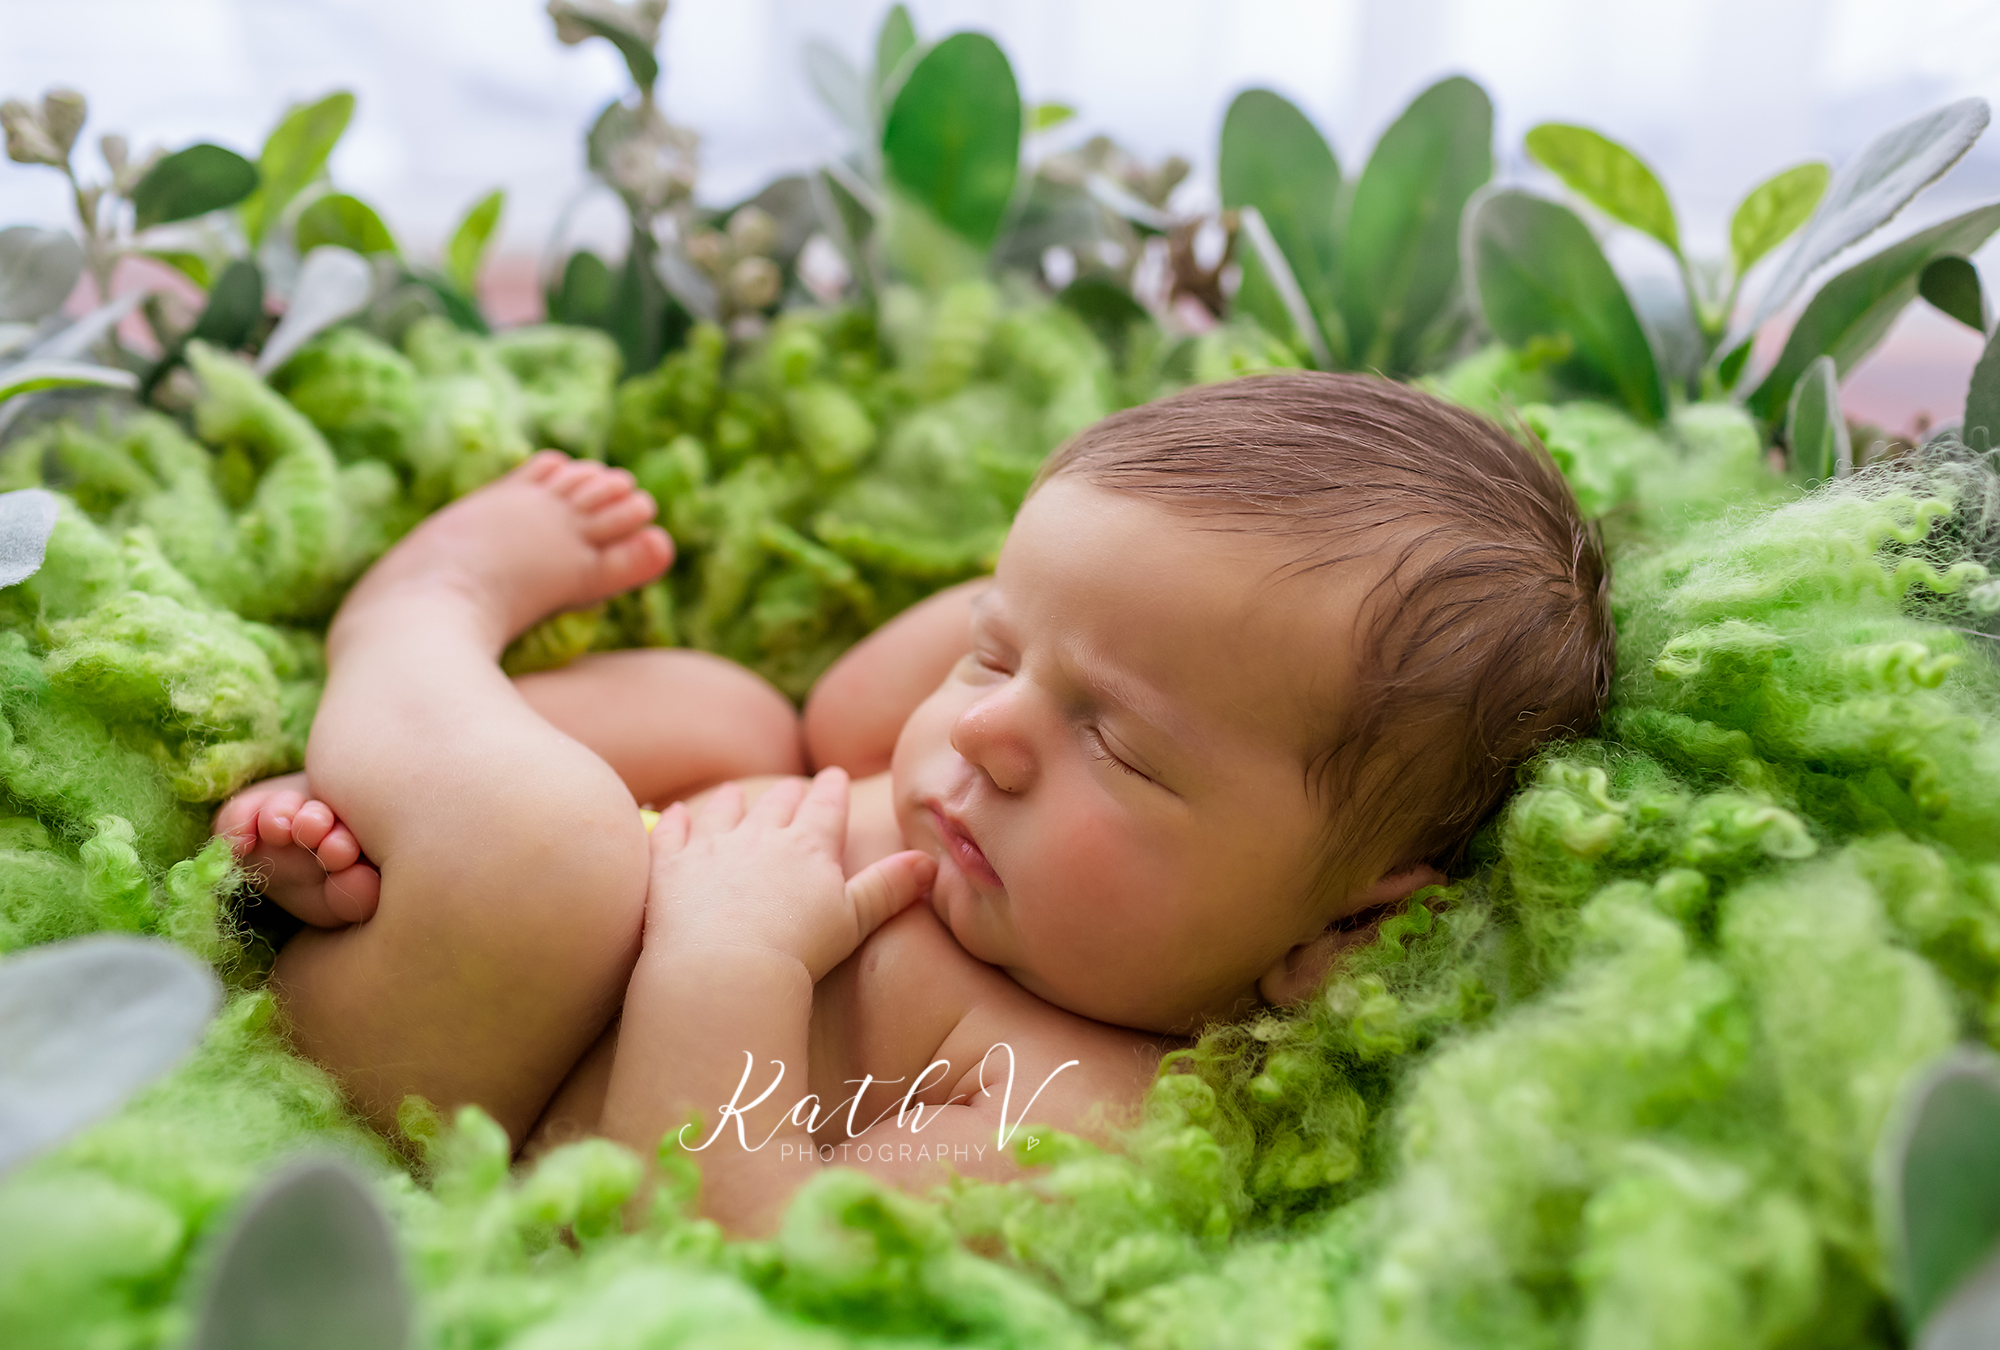 Melbourne-Newborn-Baby-Photography-547.jpg